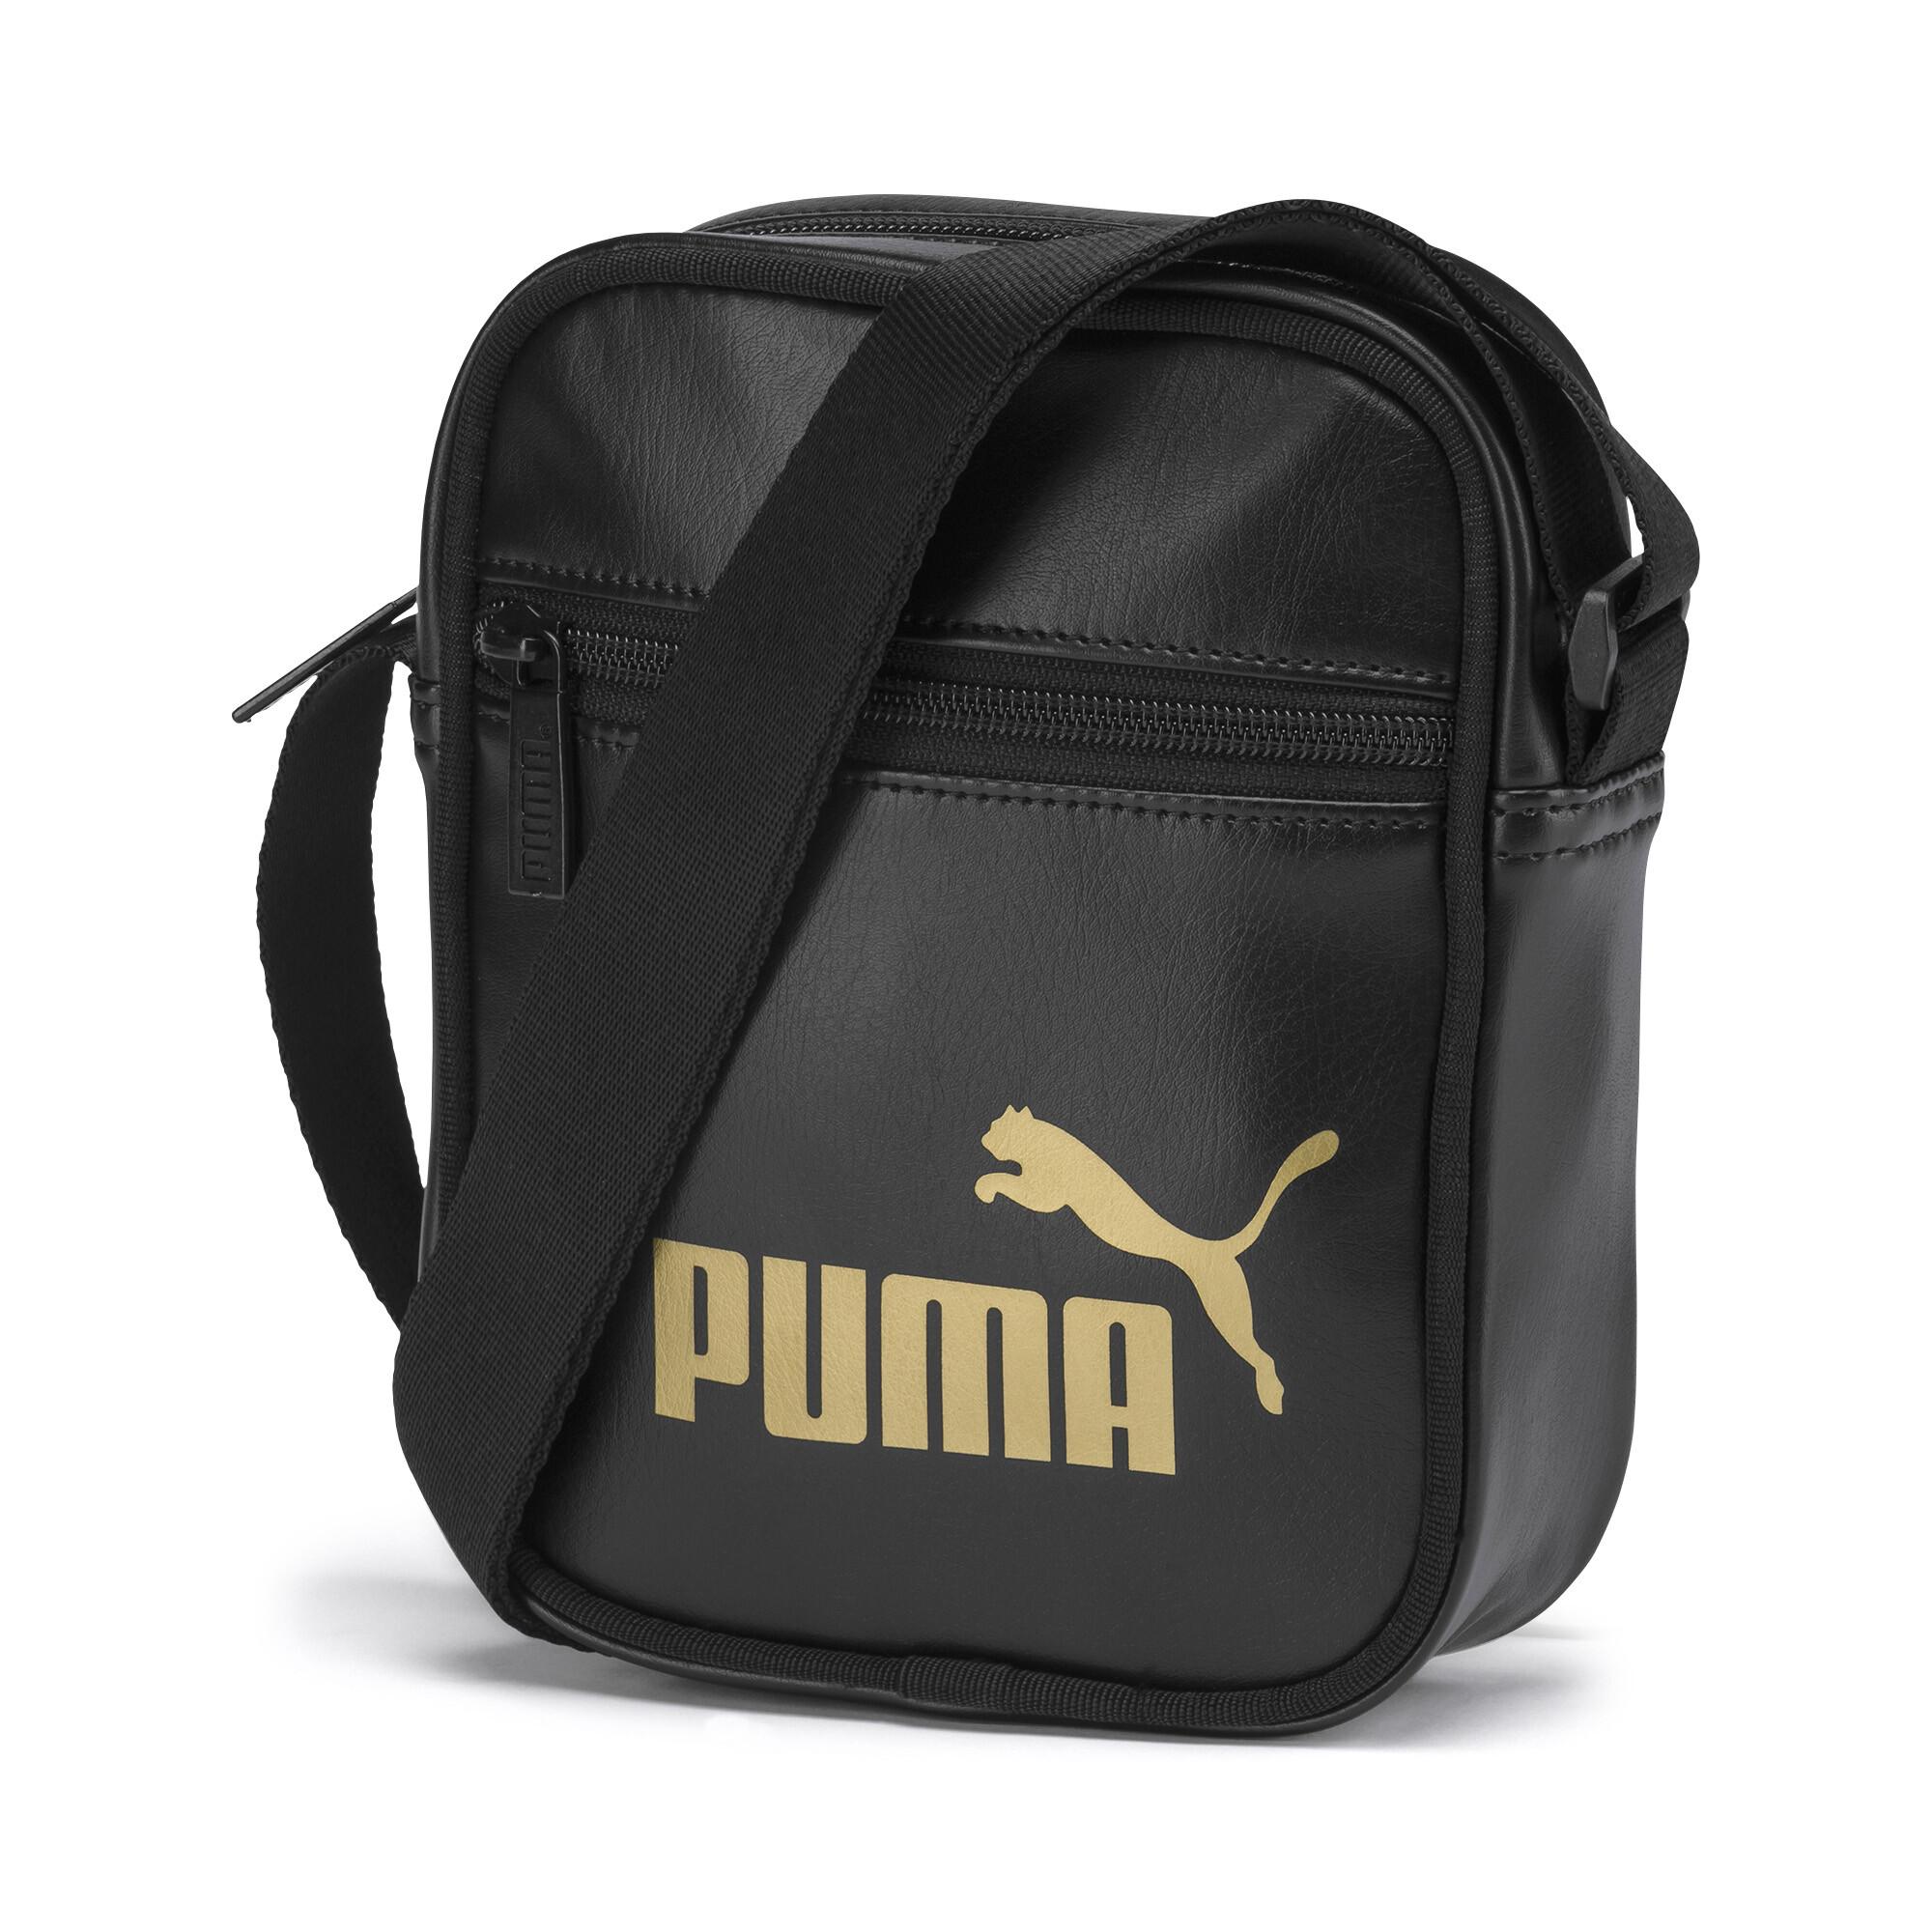 31c0a92f Up Women's Portable Shoulder Bag